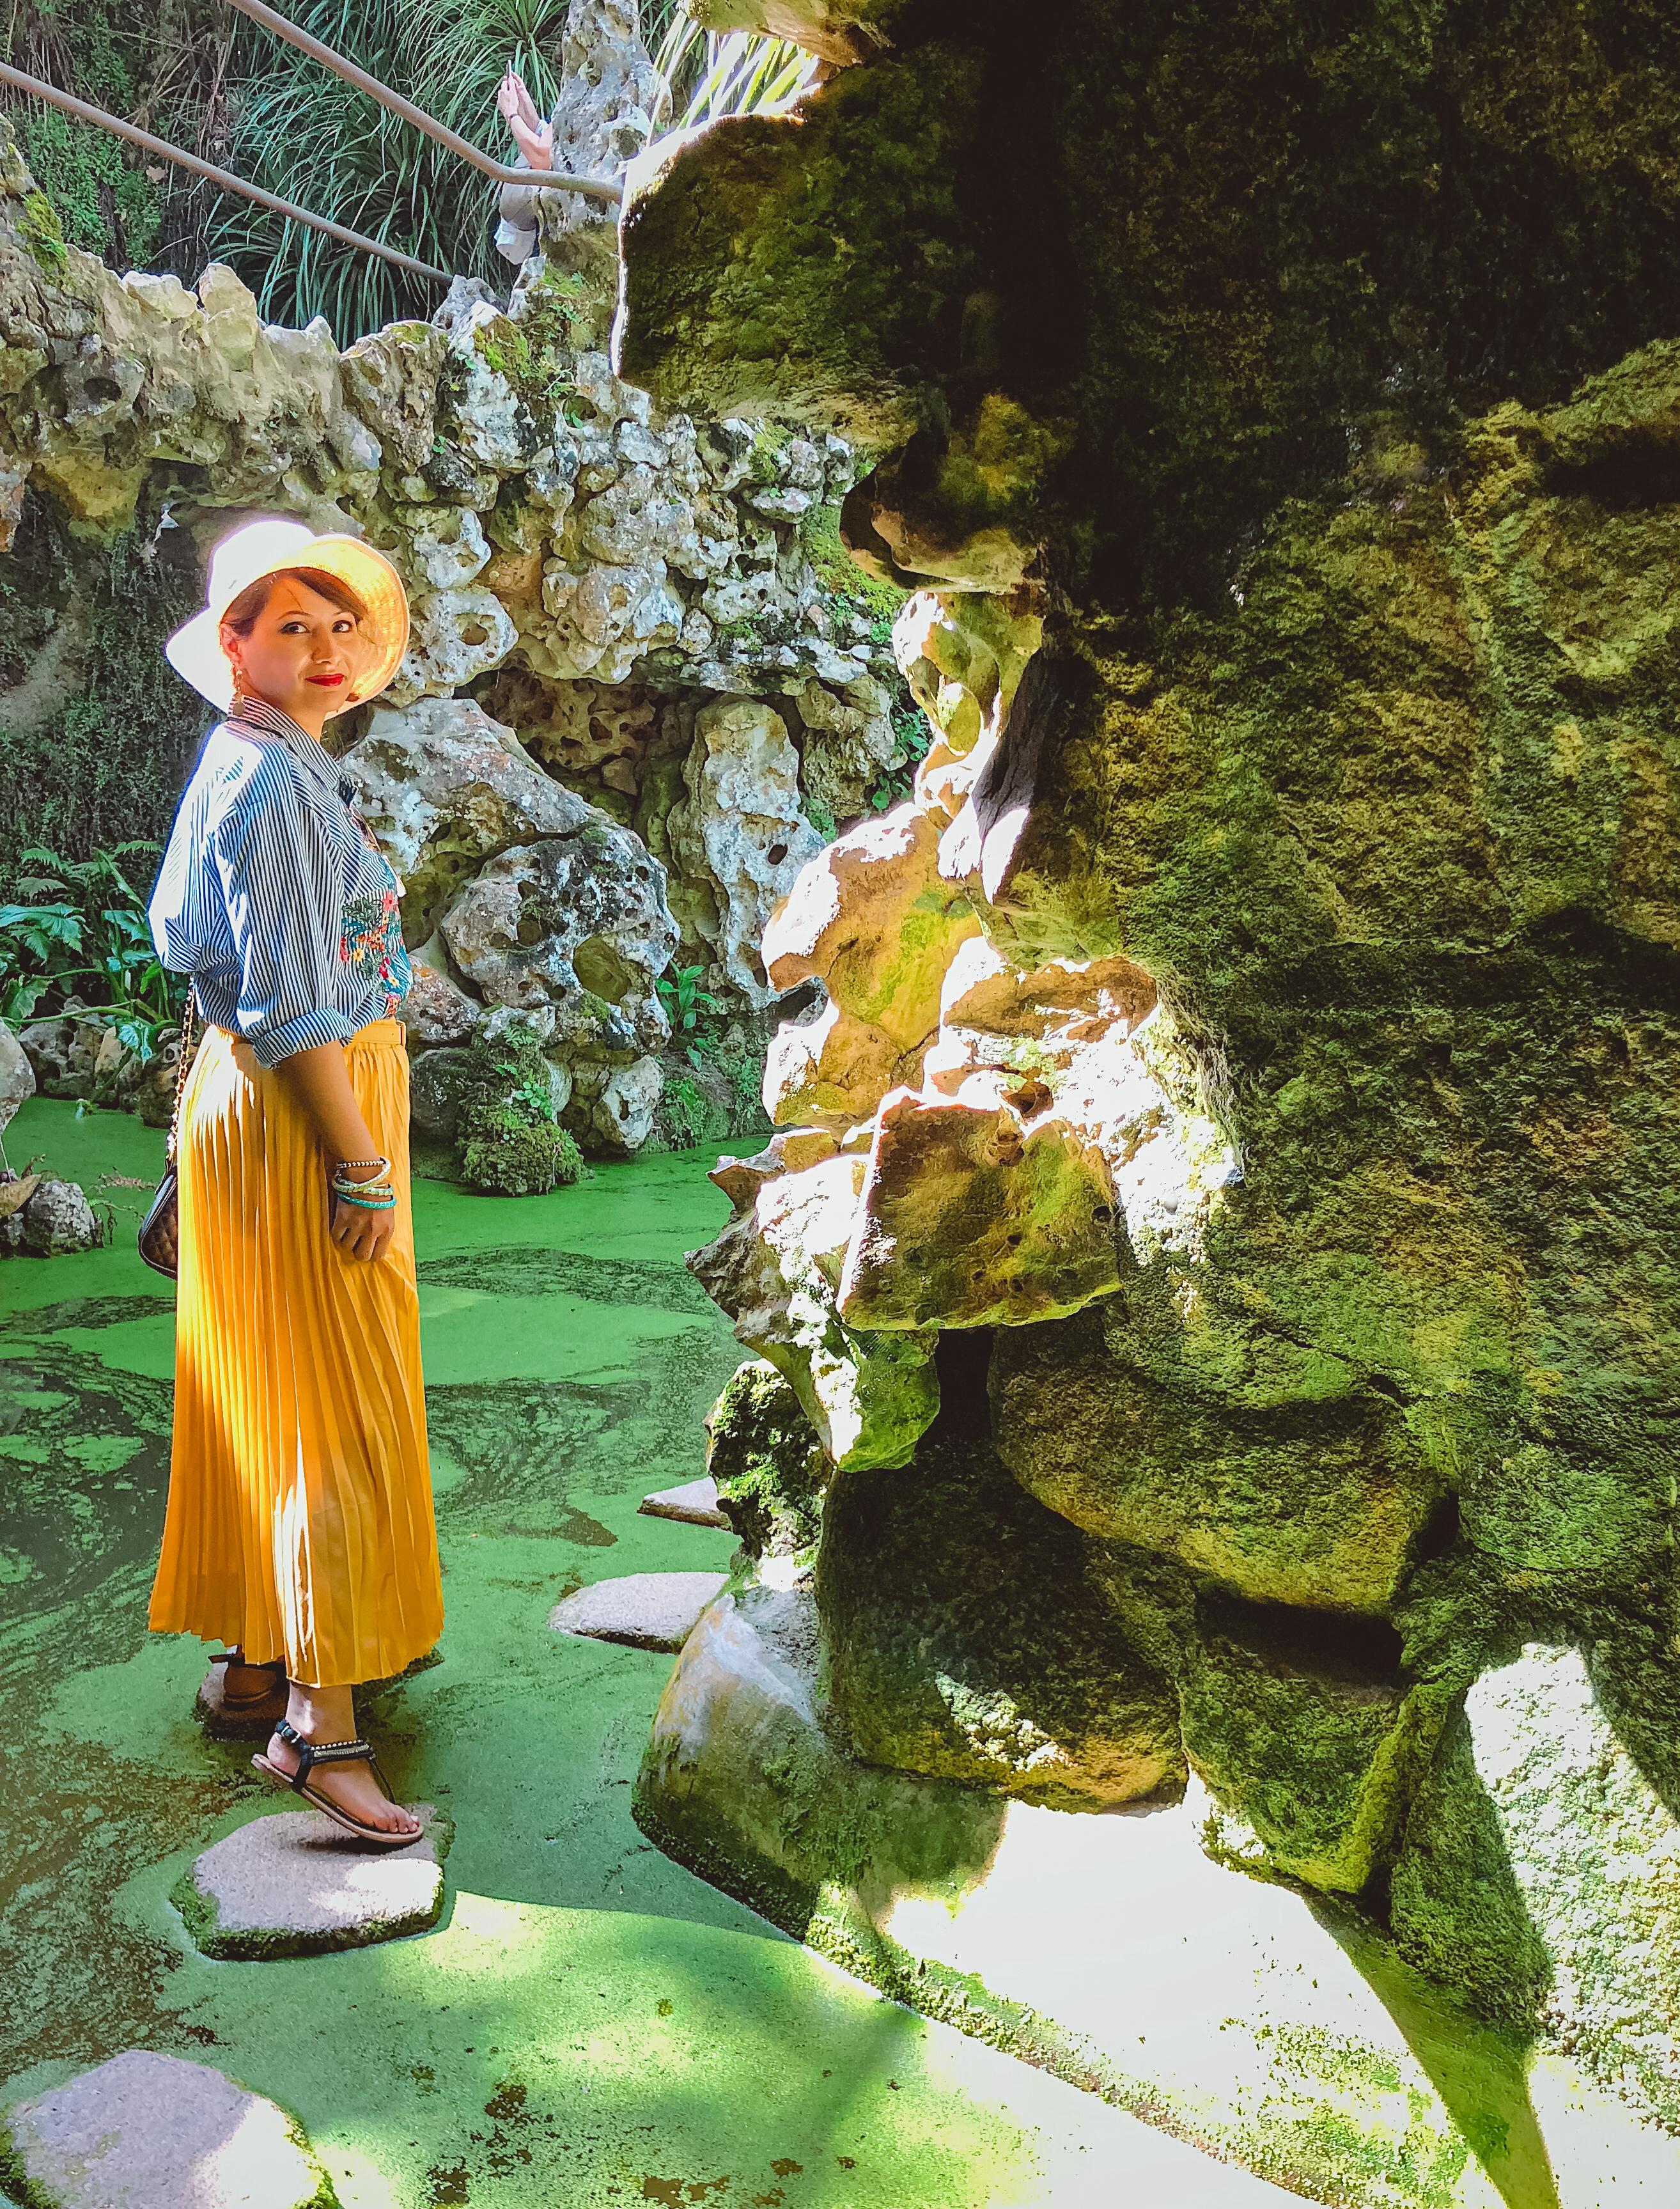 Muslim-travel-guide-Sintra-Portugal-Quinta-da-Regaleira-garden-water-caves